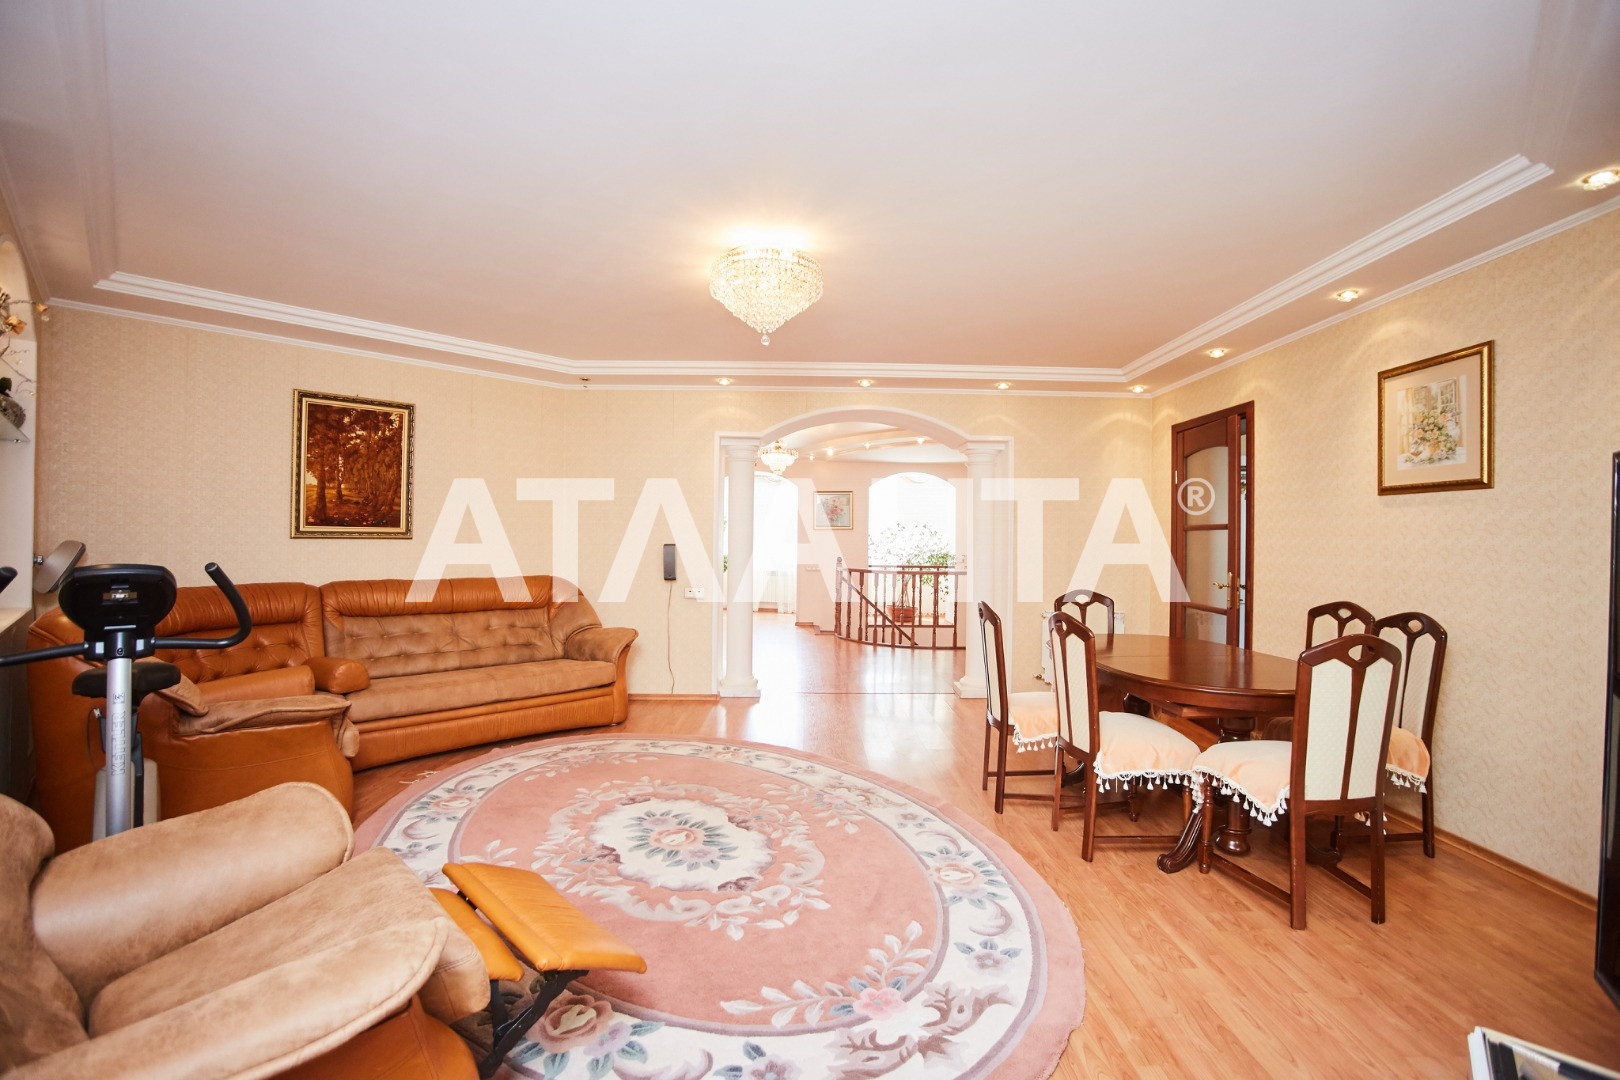 Продается Многоуровневая Квартира на ул. Посмитного — 295 000 у.е. (фото №14)